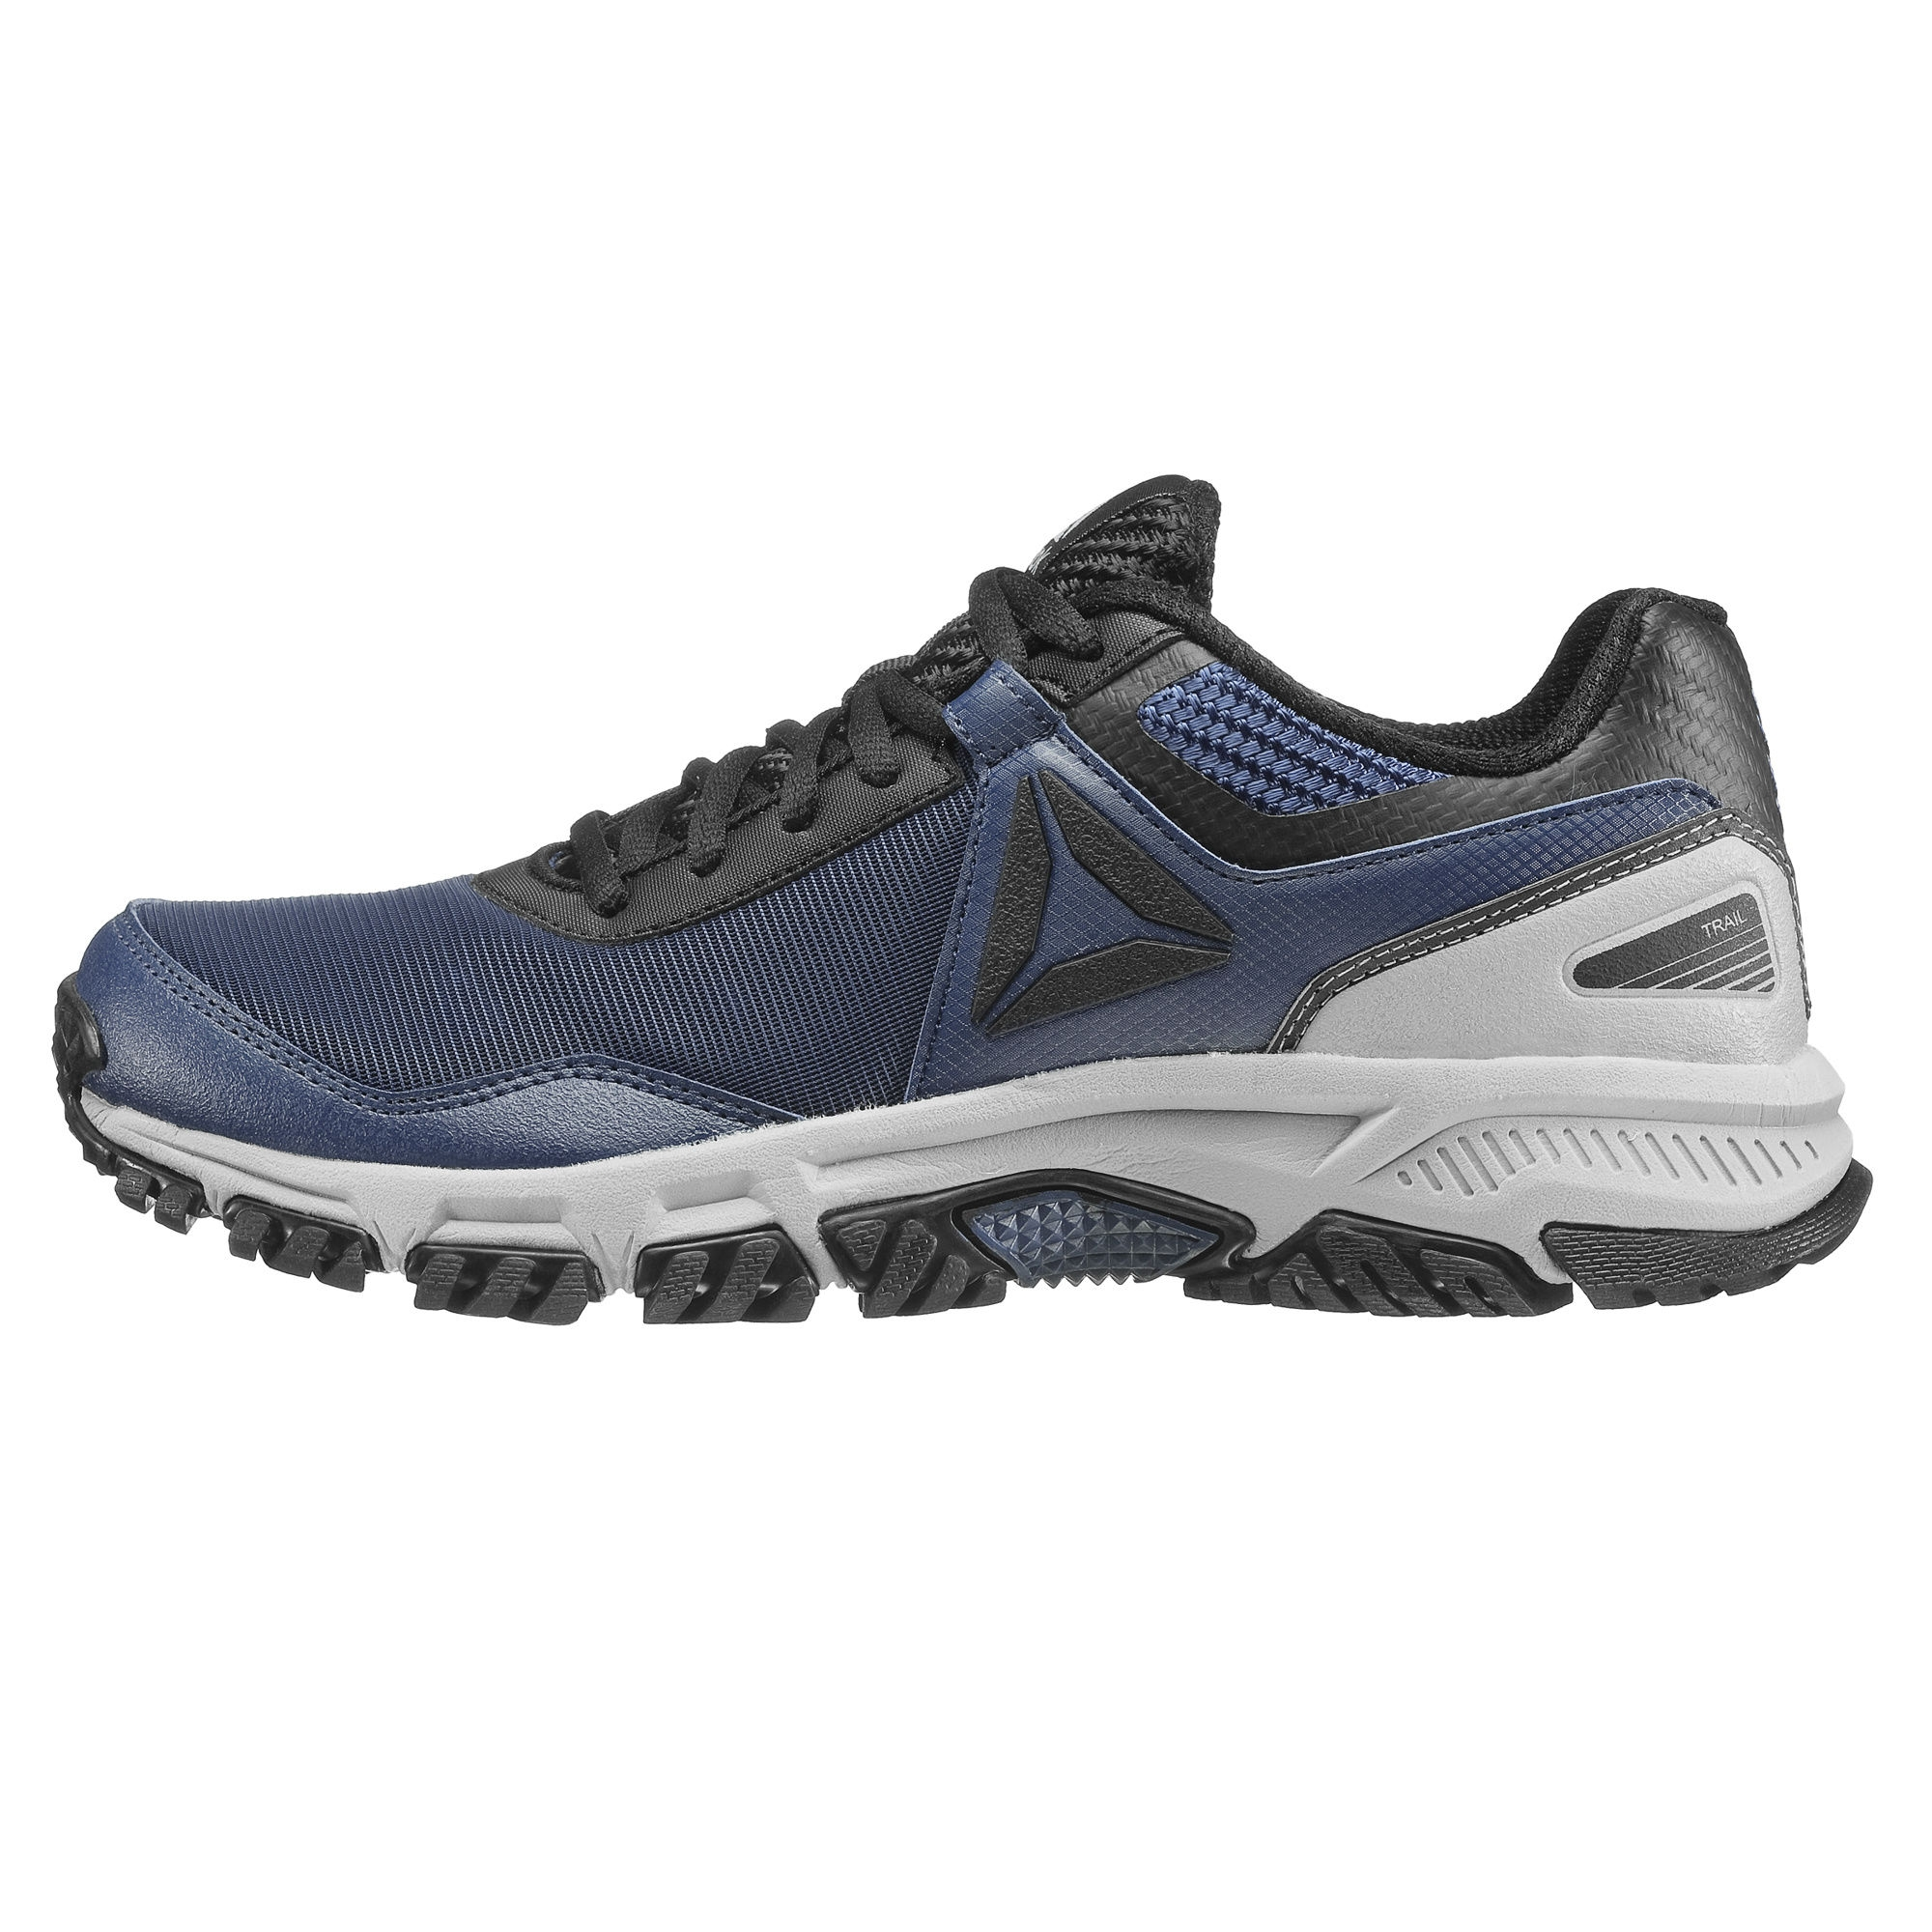 timeless design ff83d 1791c Chaussures Reebok Ridgerider Trail 3.0